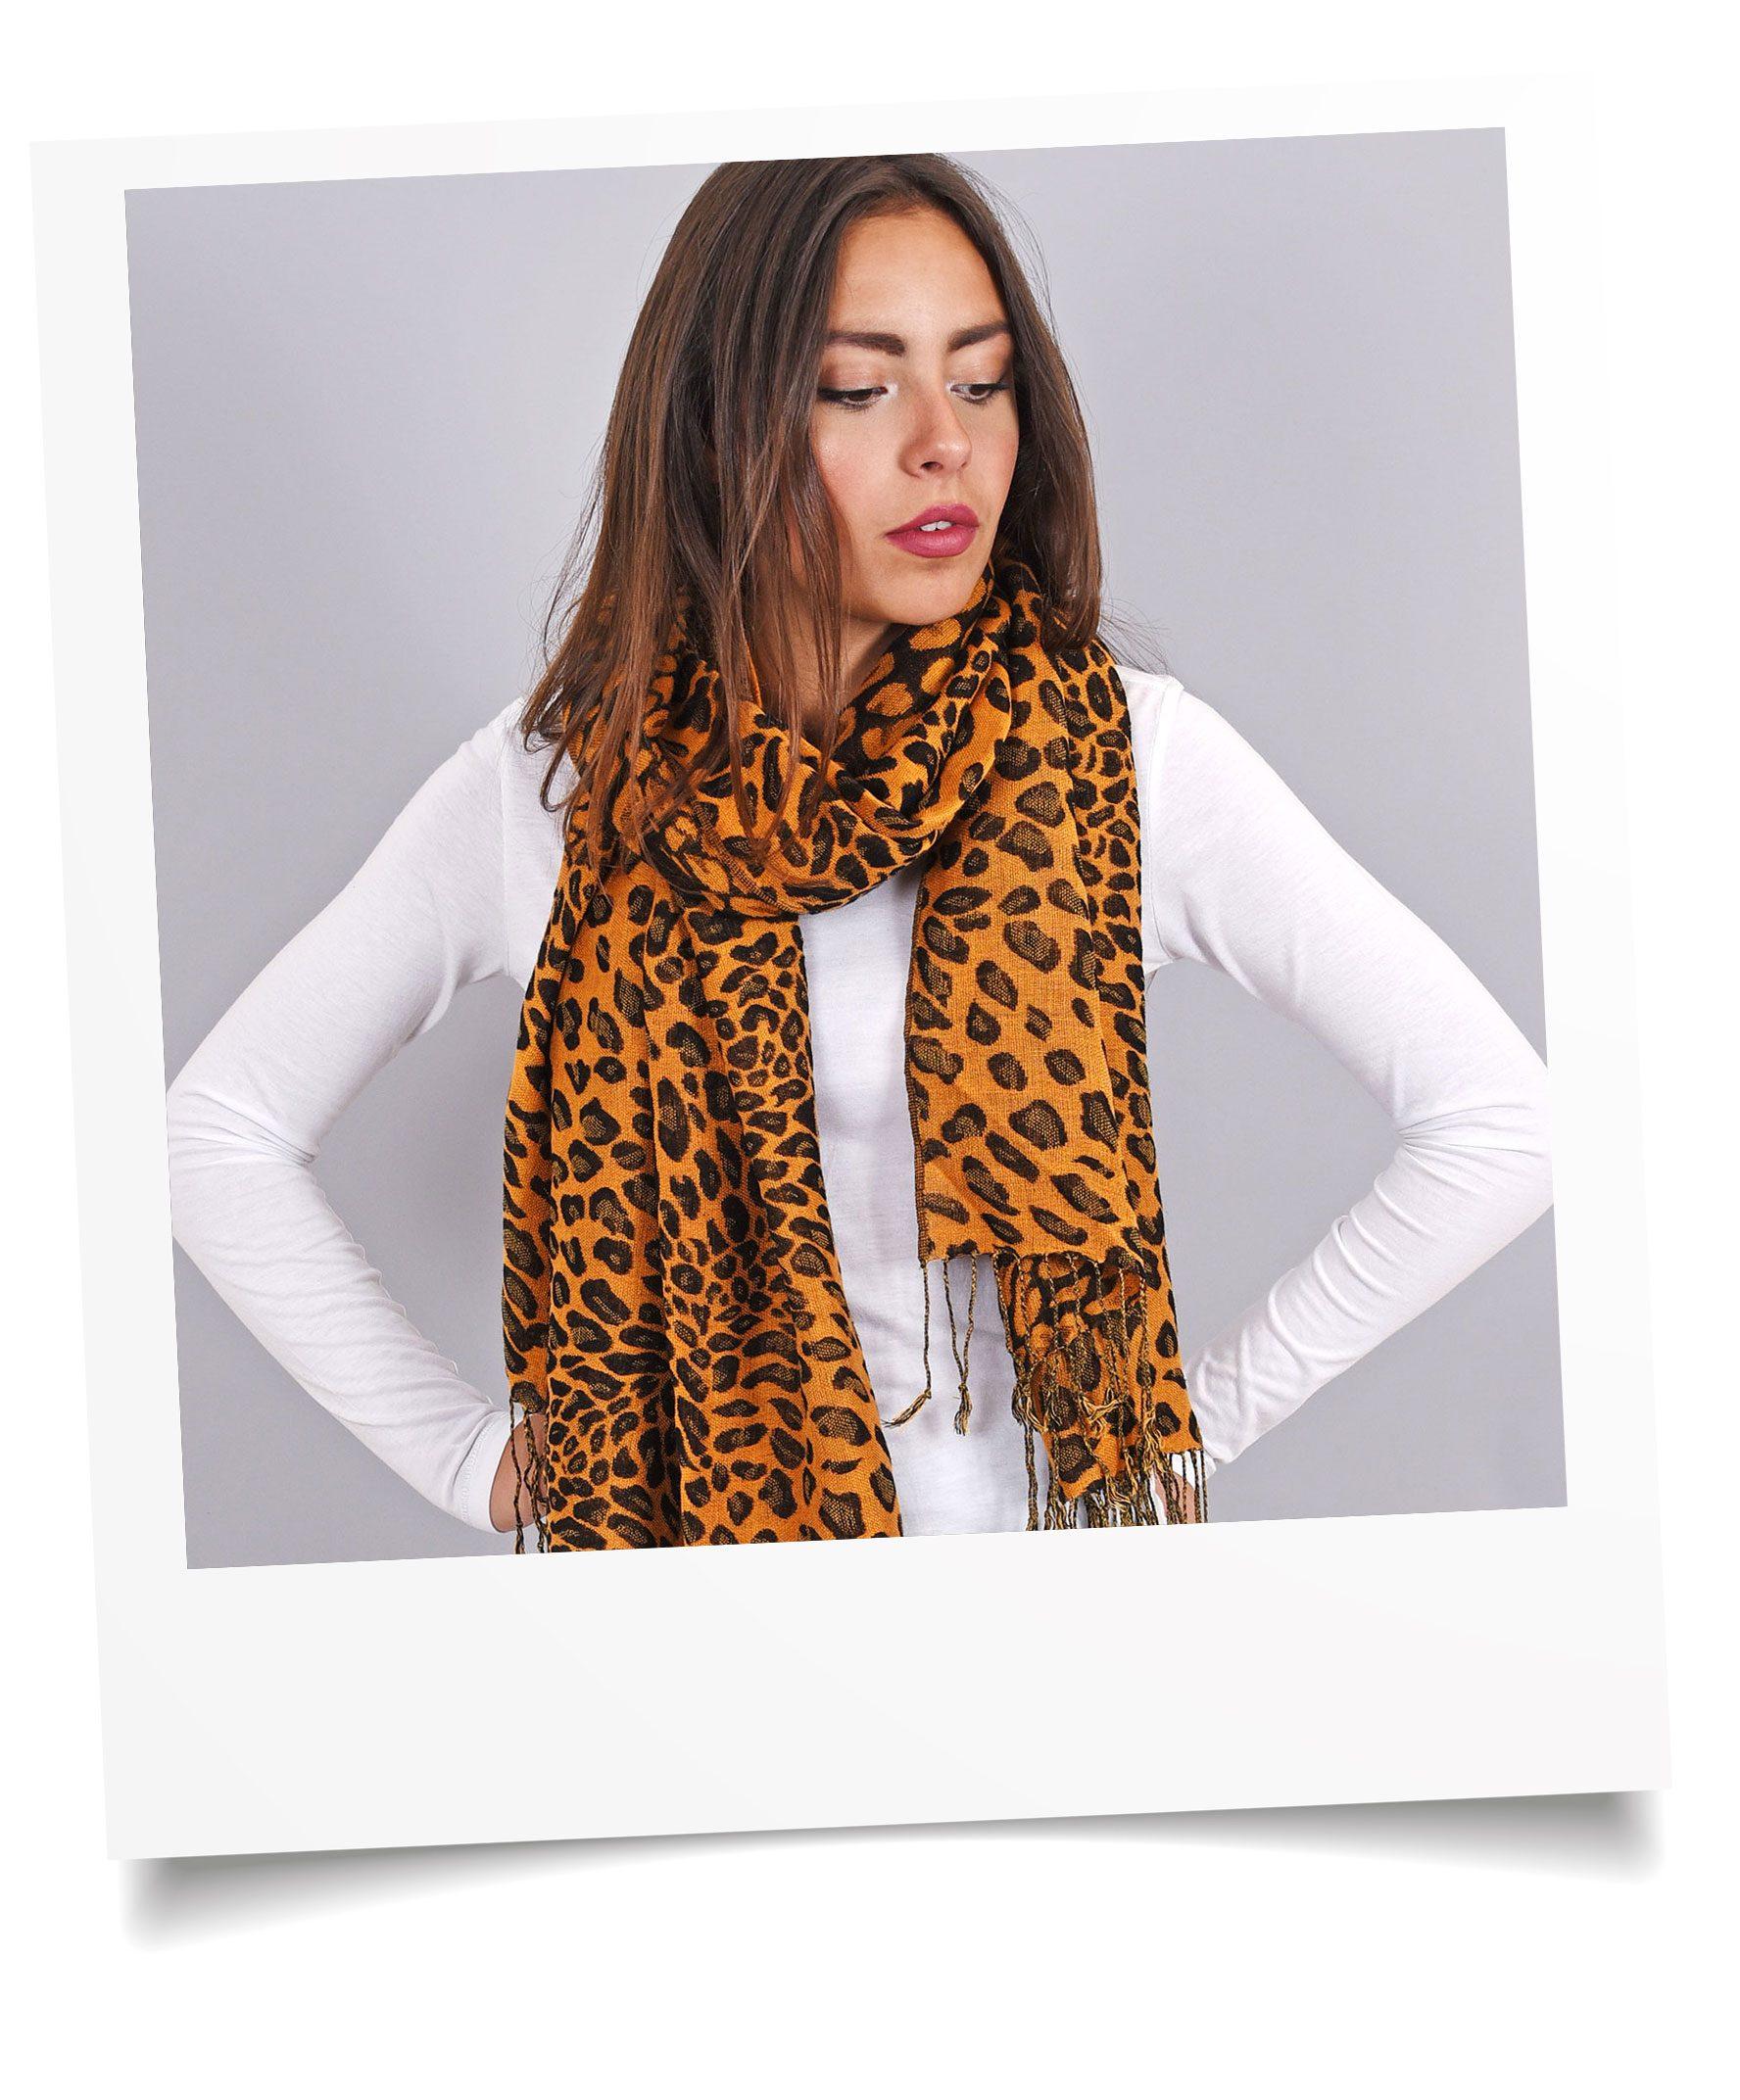 http://lookbook.allee-du-foulard.fr/wp-content/uploads/2018/09/0695-1-ADF-Accessoires-de-mode-LB-Selection_leopard-echarpe-orange-marron-1776x2144.jpg